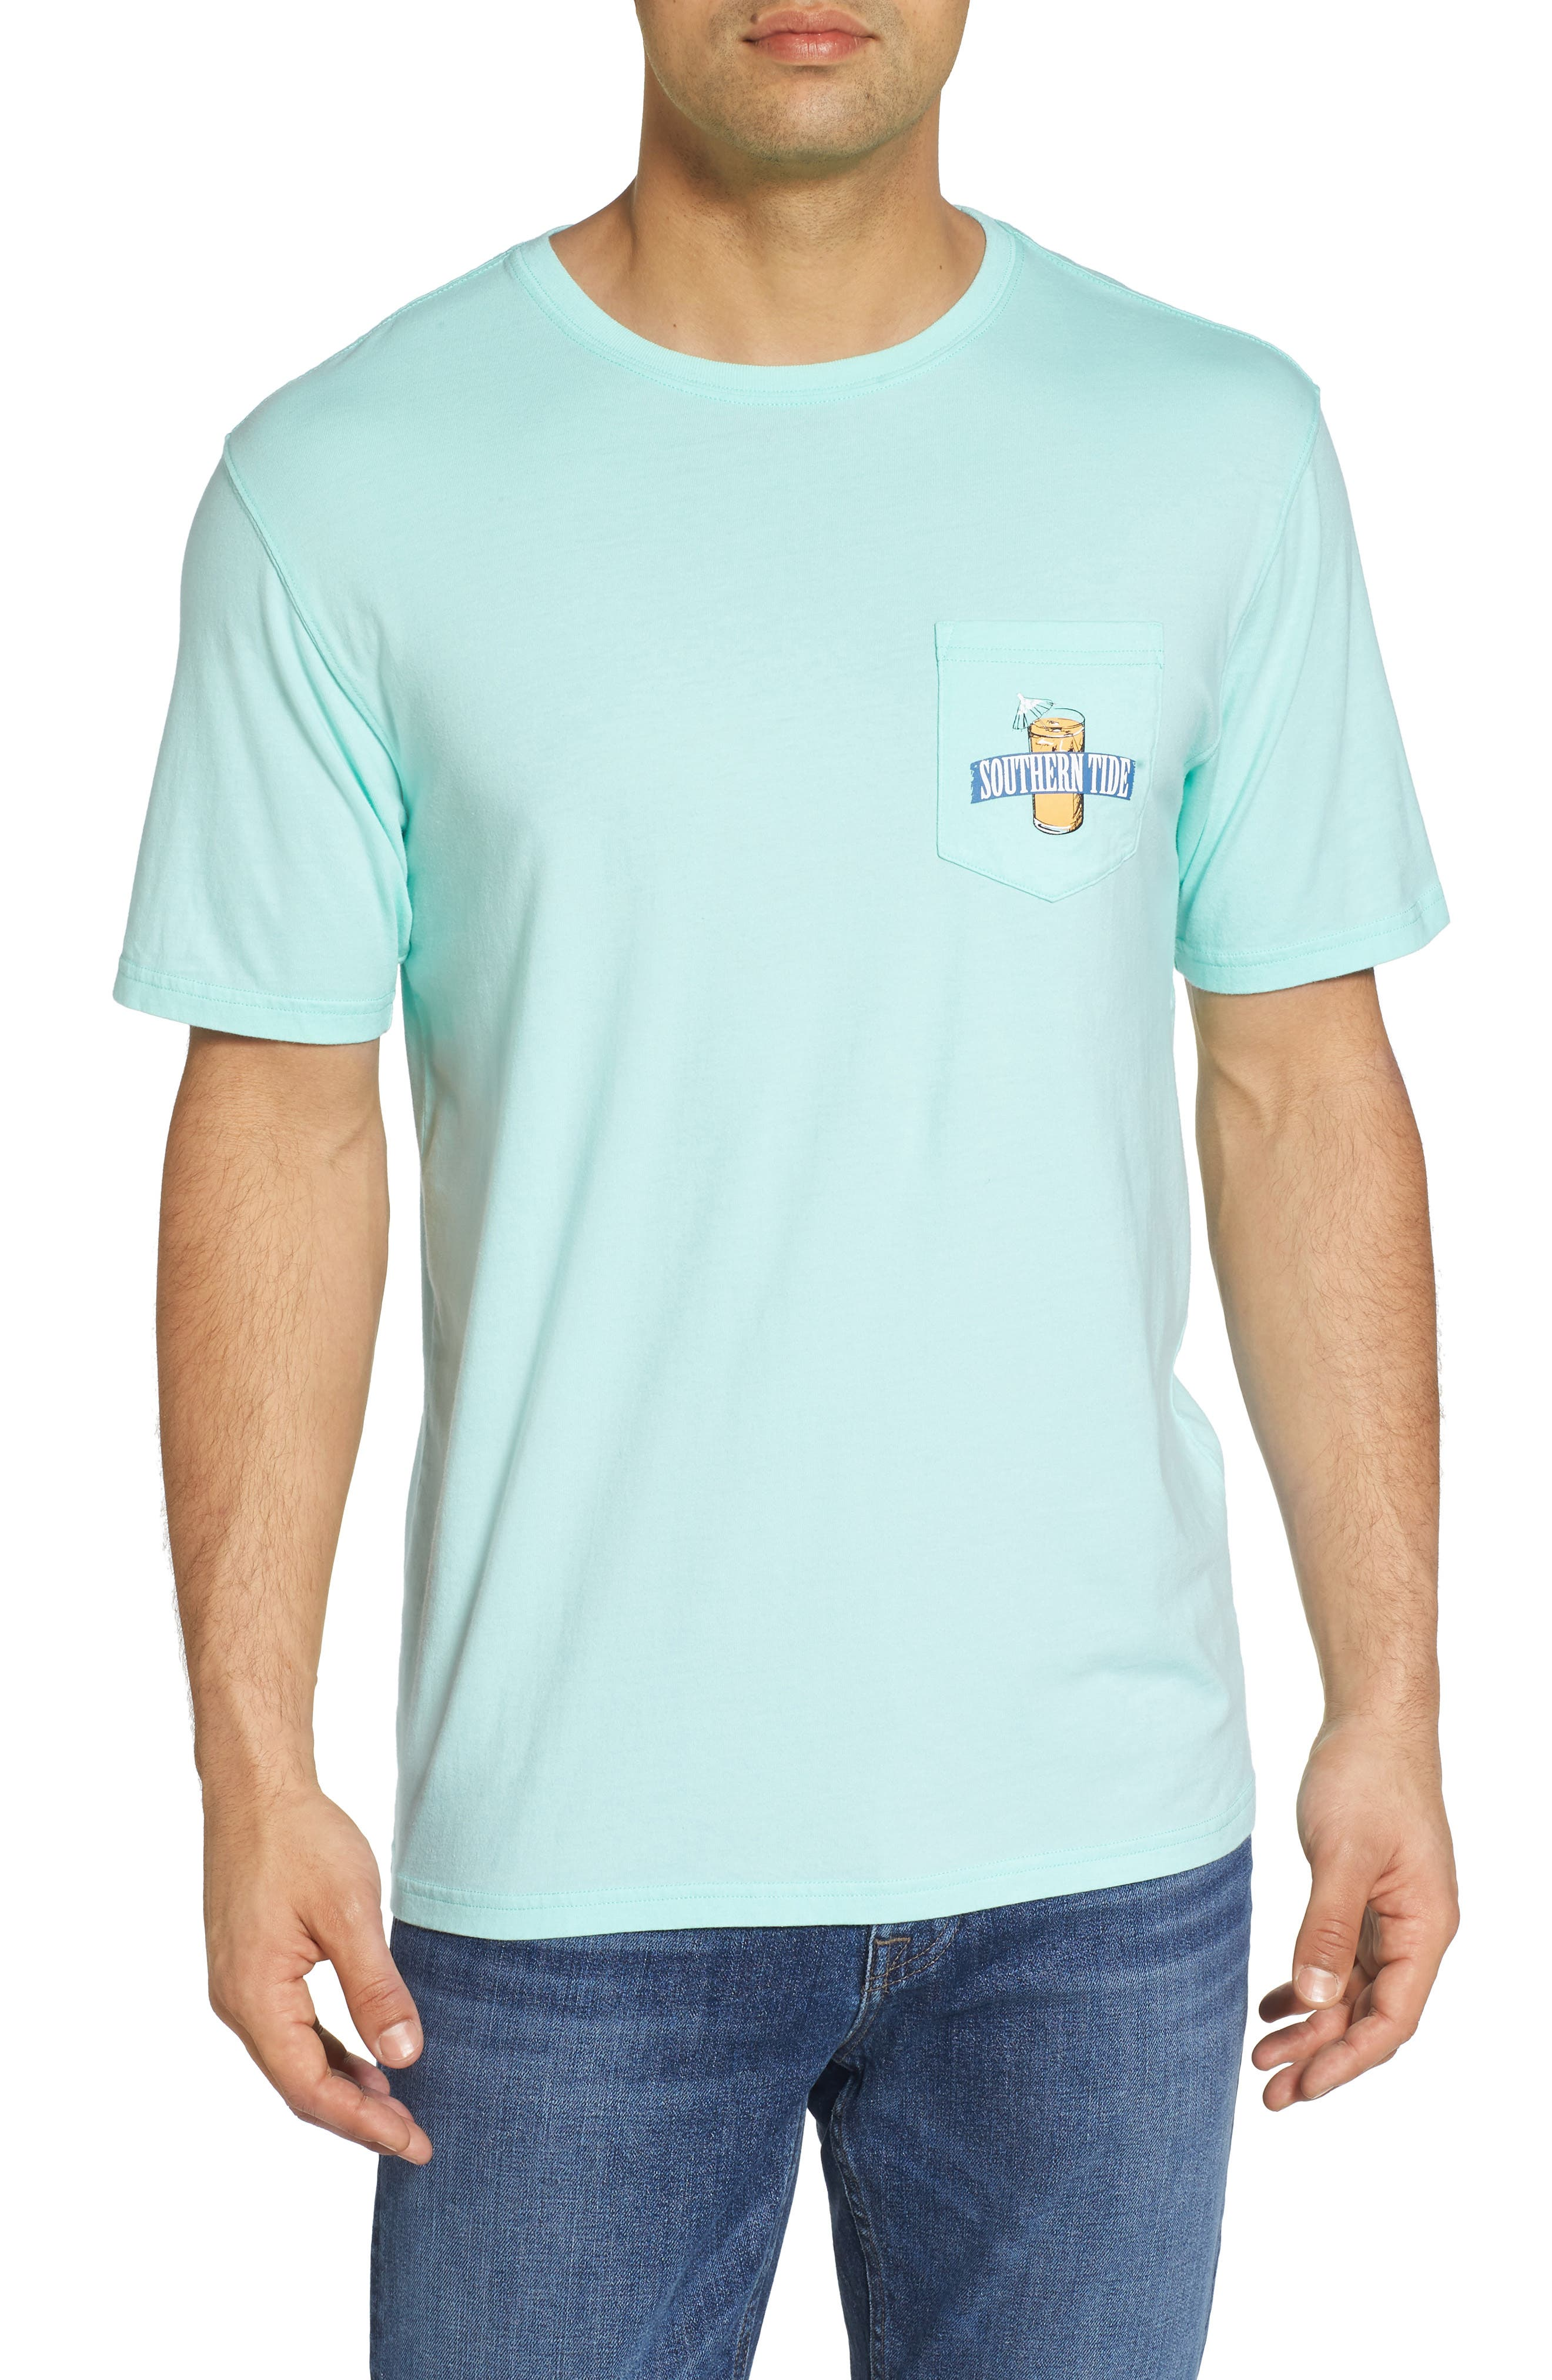 Southern Mix Crewneck T-Shirt,                         Main,                         color, Off Shore Green